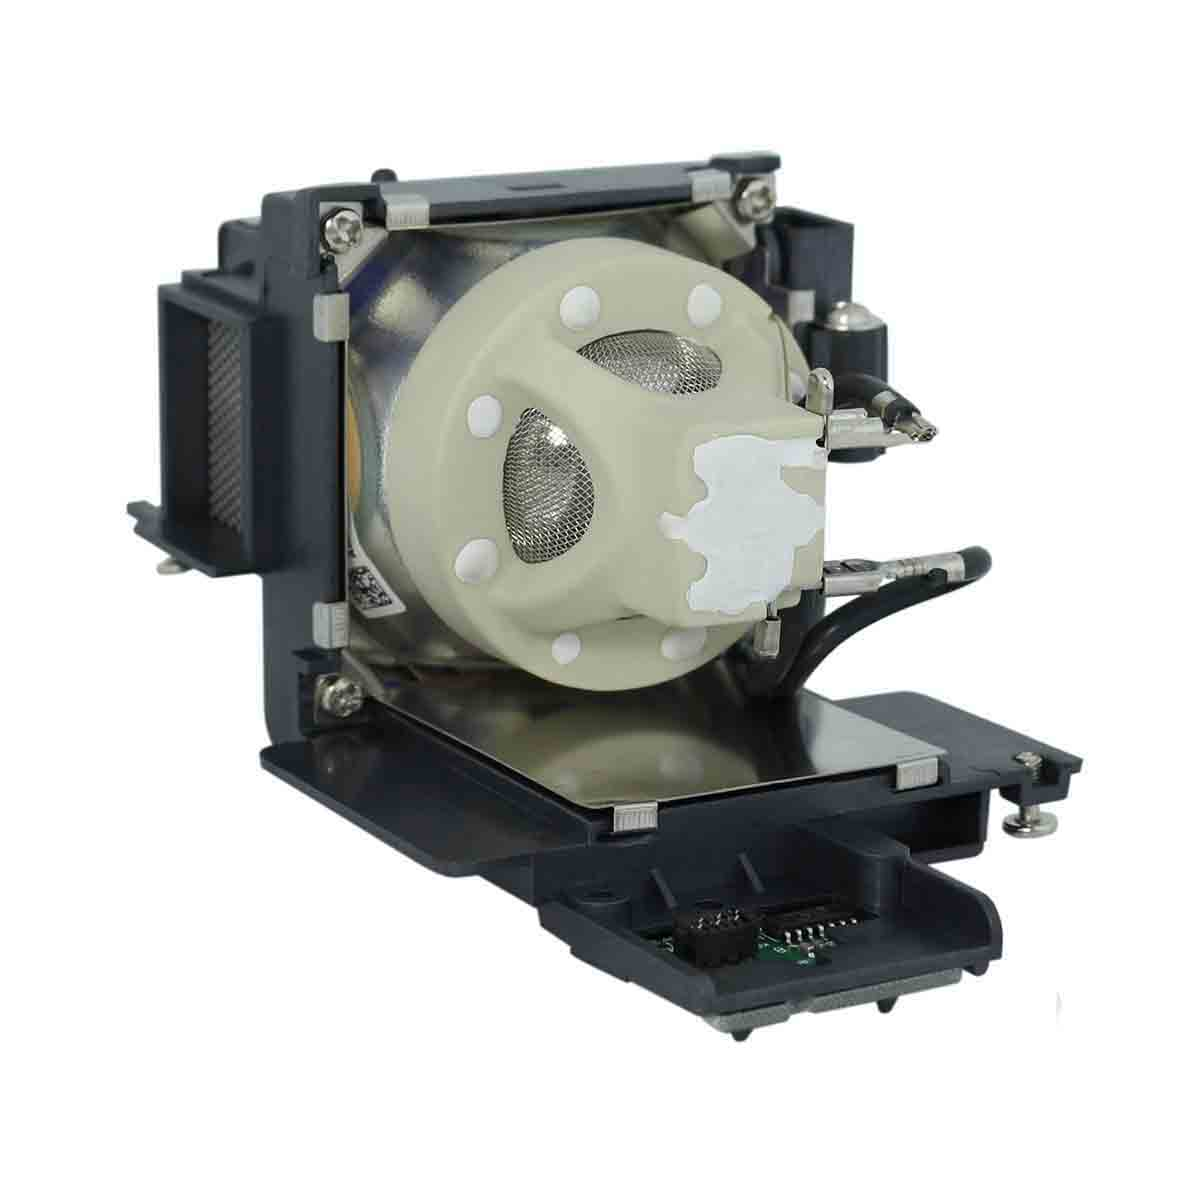 Original Philips Projector Replacement Lamp for Panasonic ET-LAV100